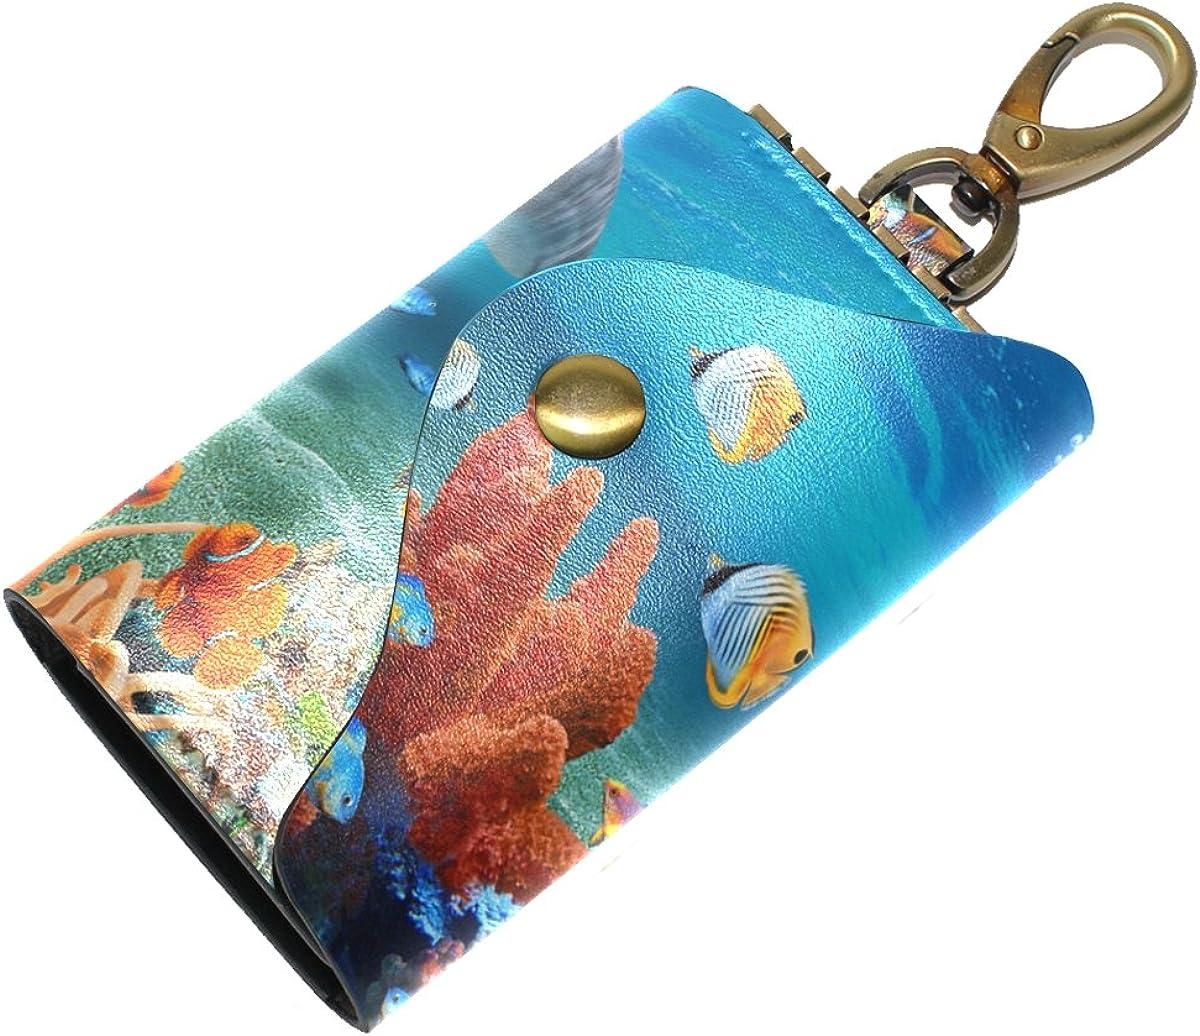 DEYYA Love Dolphins Leather Key Case Wallets Unisex Keychain Key Holder with 6 Hooks Snap Closure